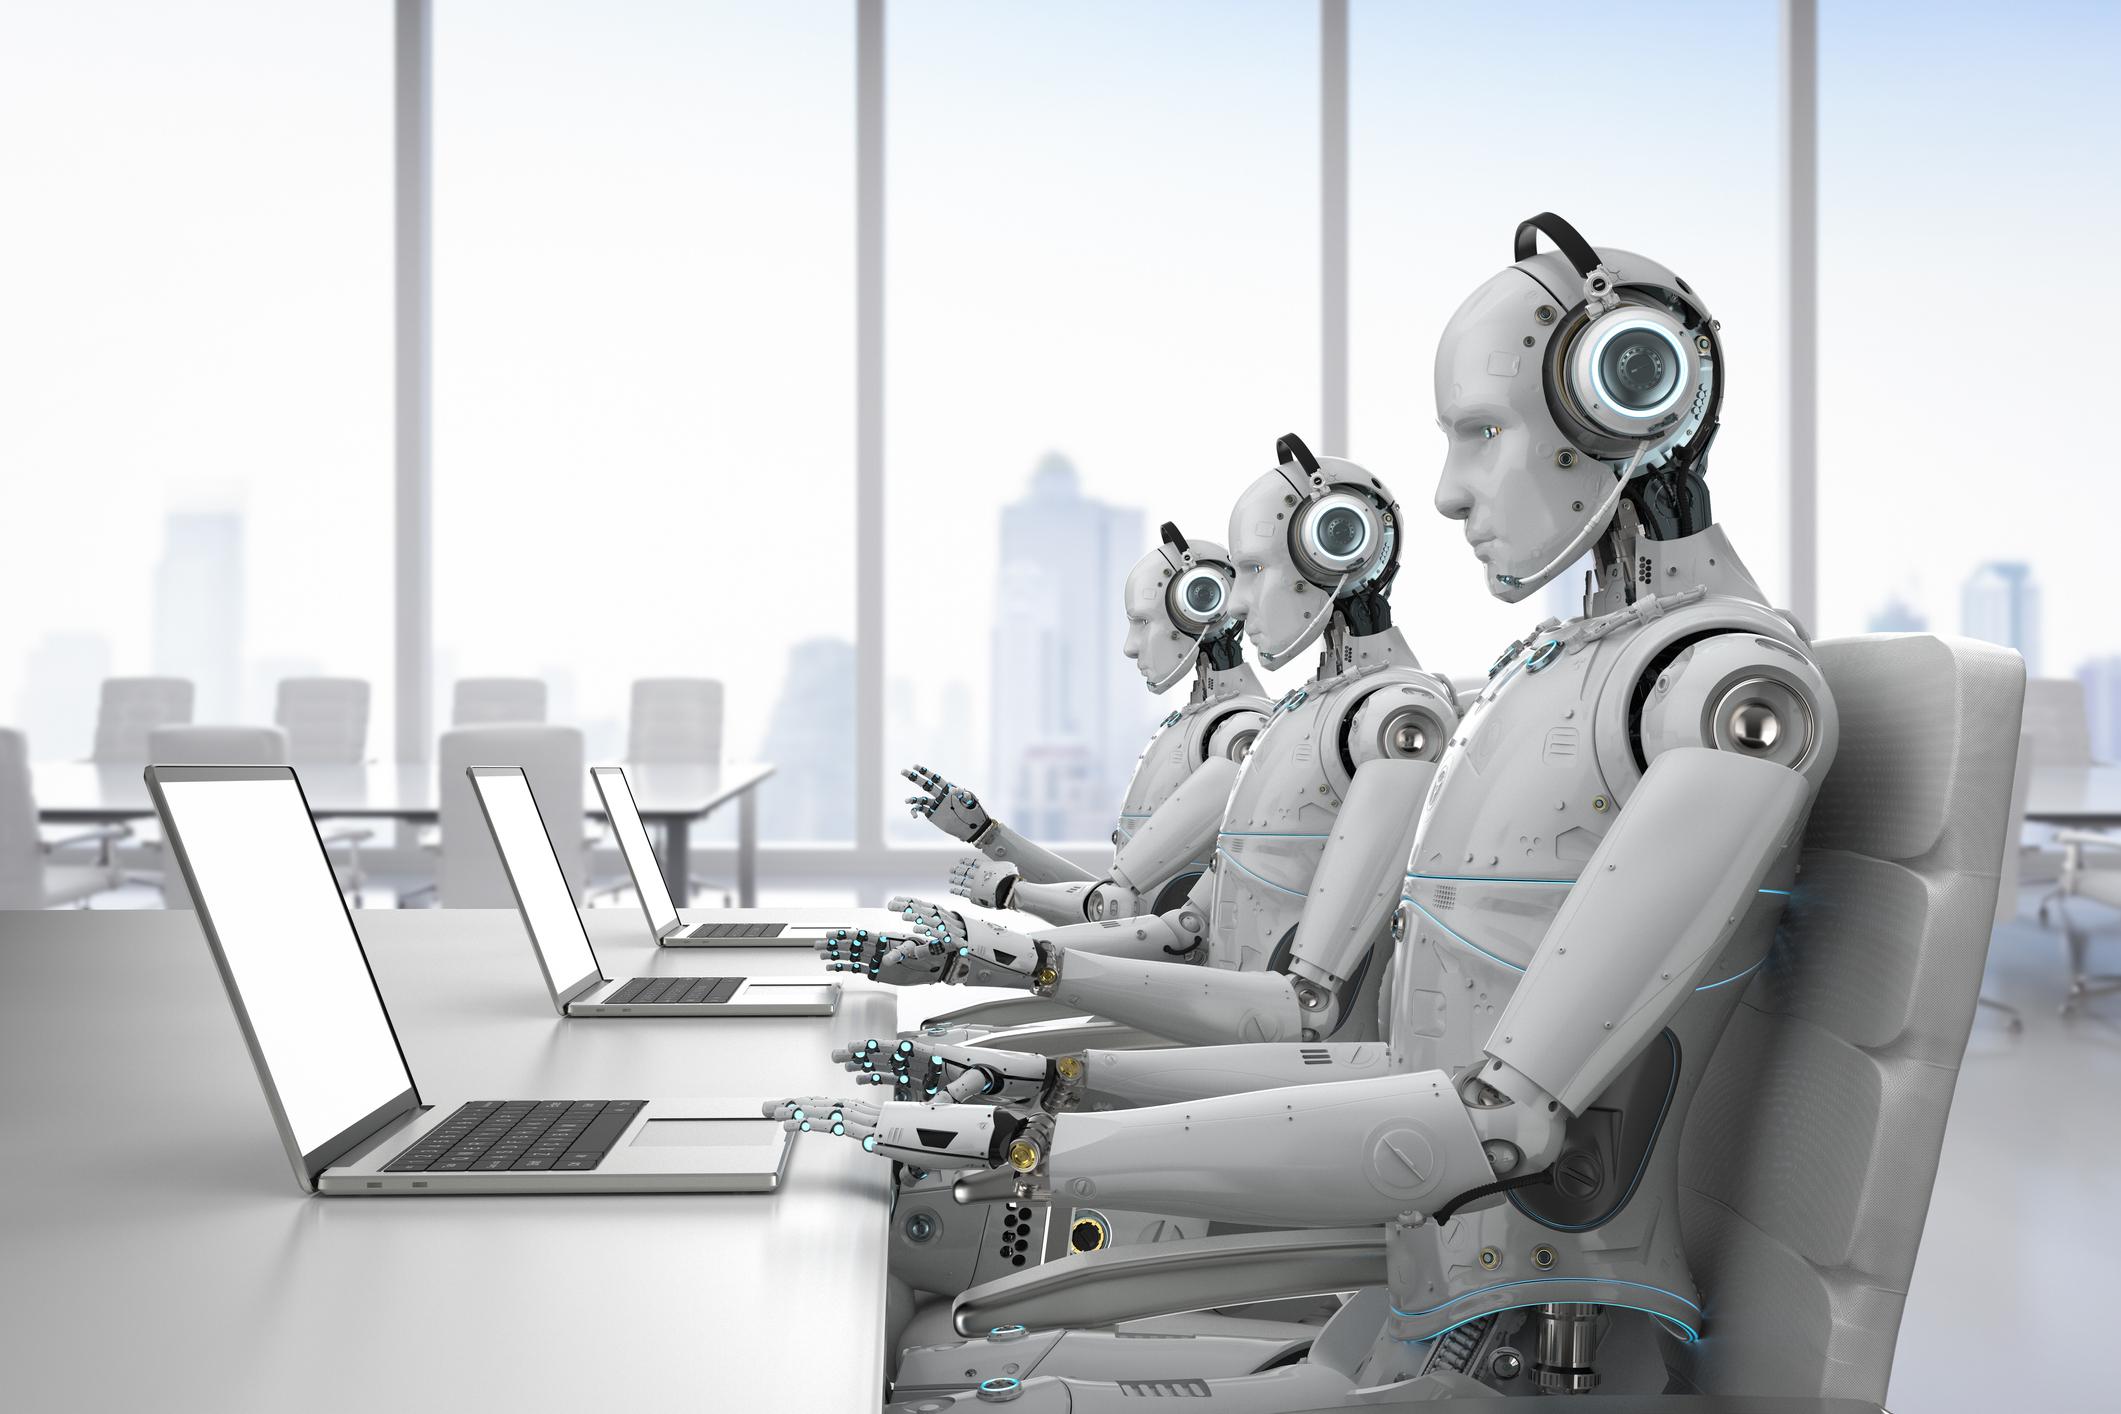 Best Binary Options Robots And Auto Trading Software - Binoption